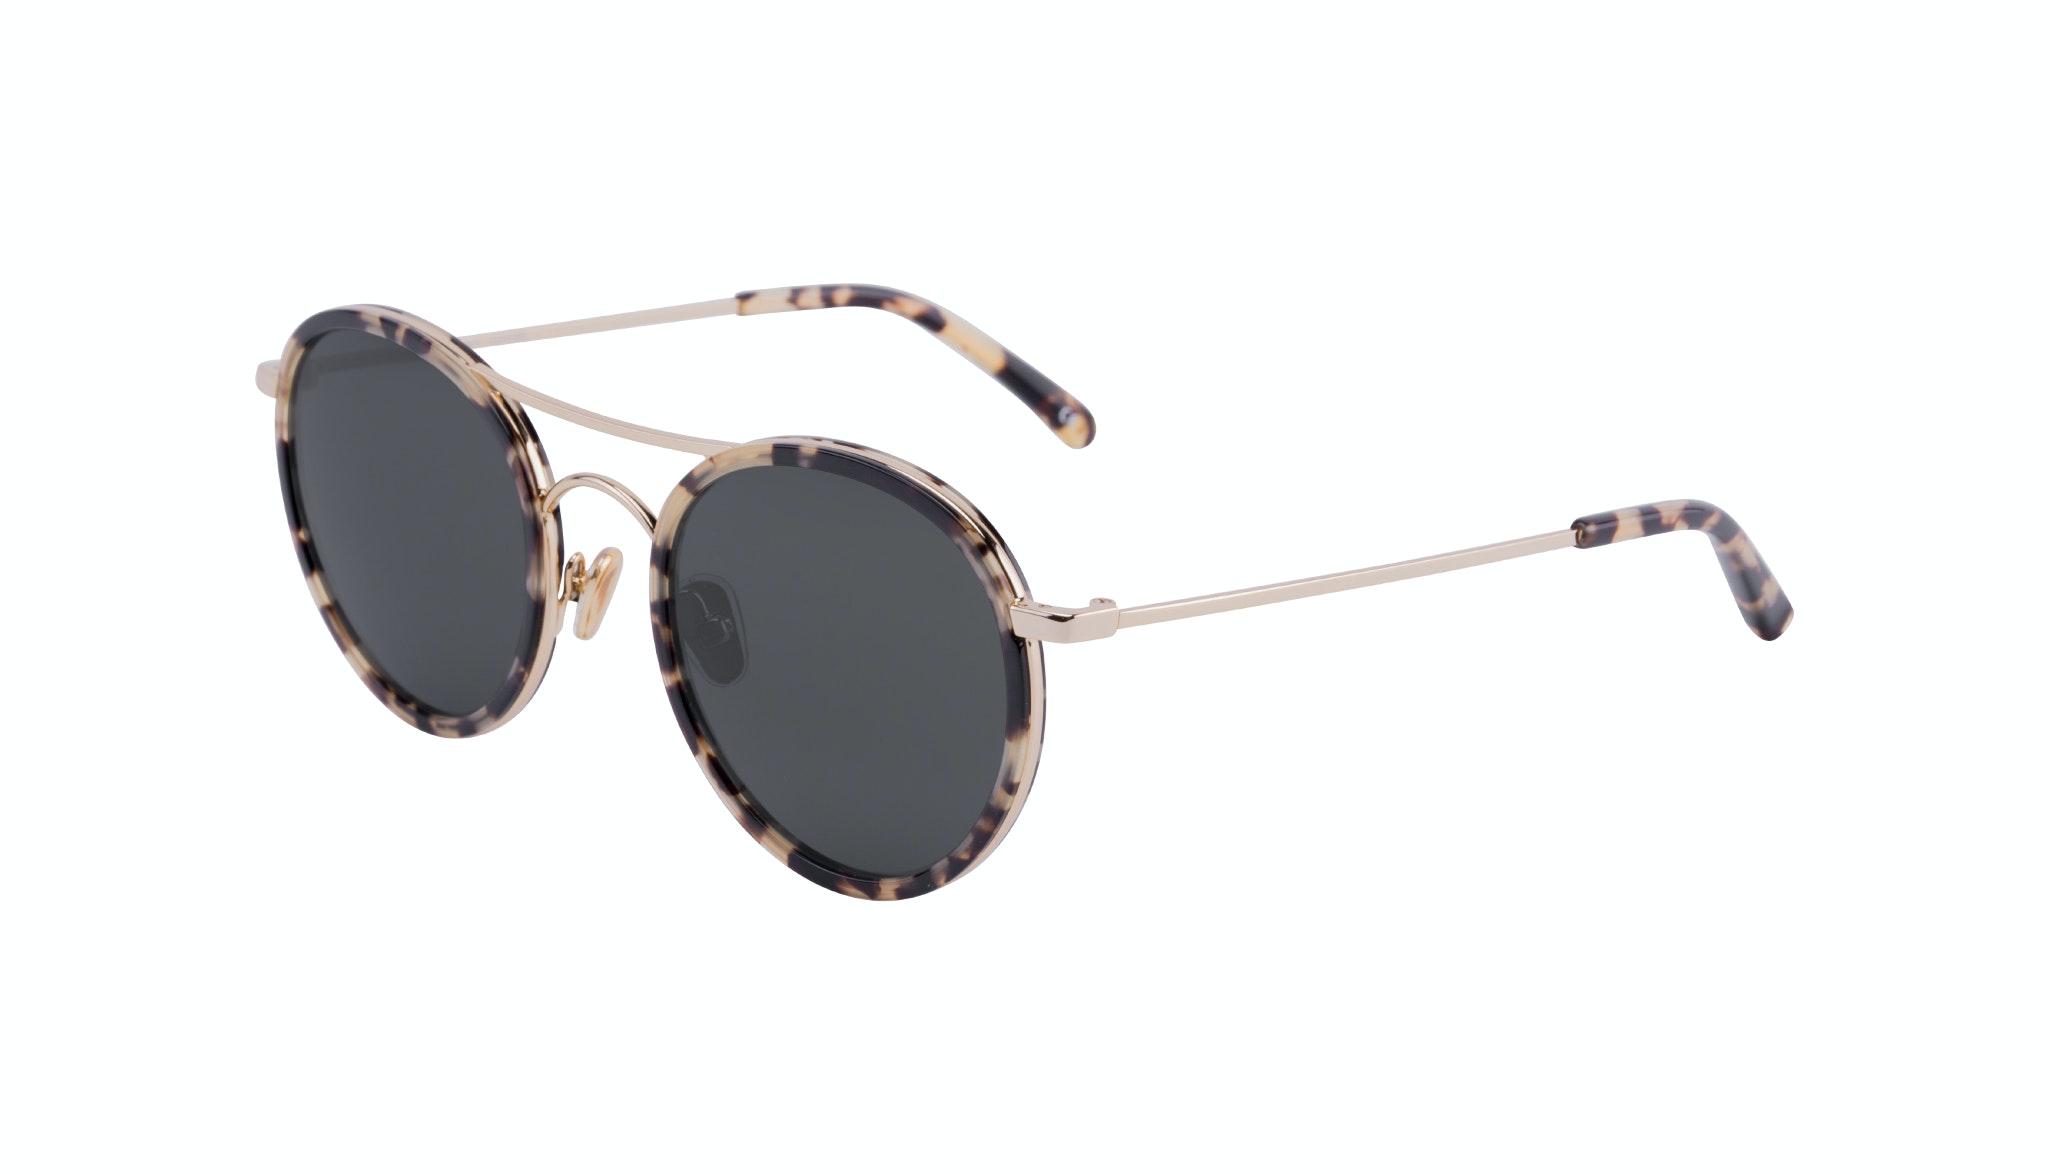 Affordable Fashion Glasses Aviator Round Sunglasses Women Dawn Tortoise Tilt